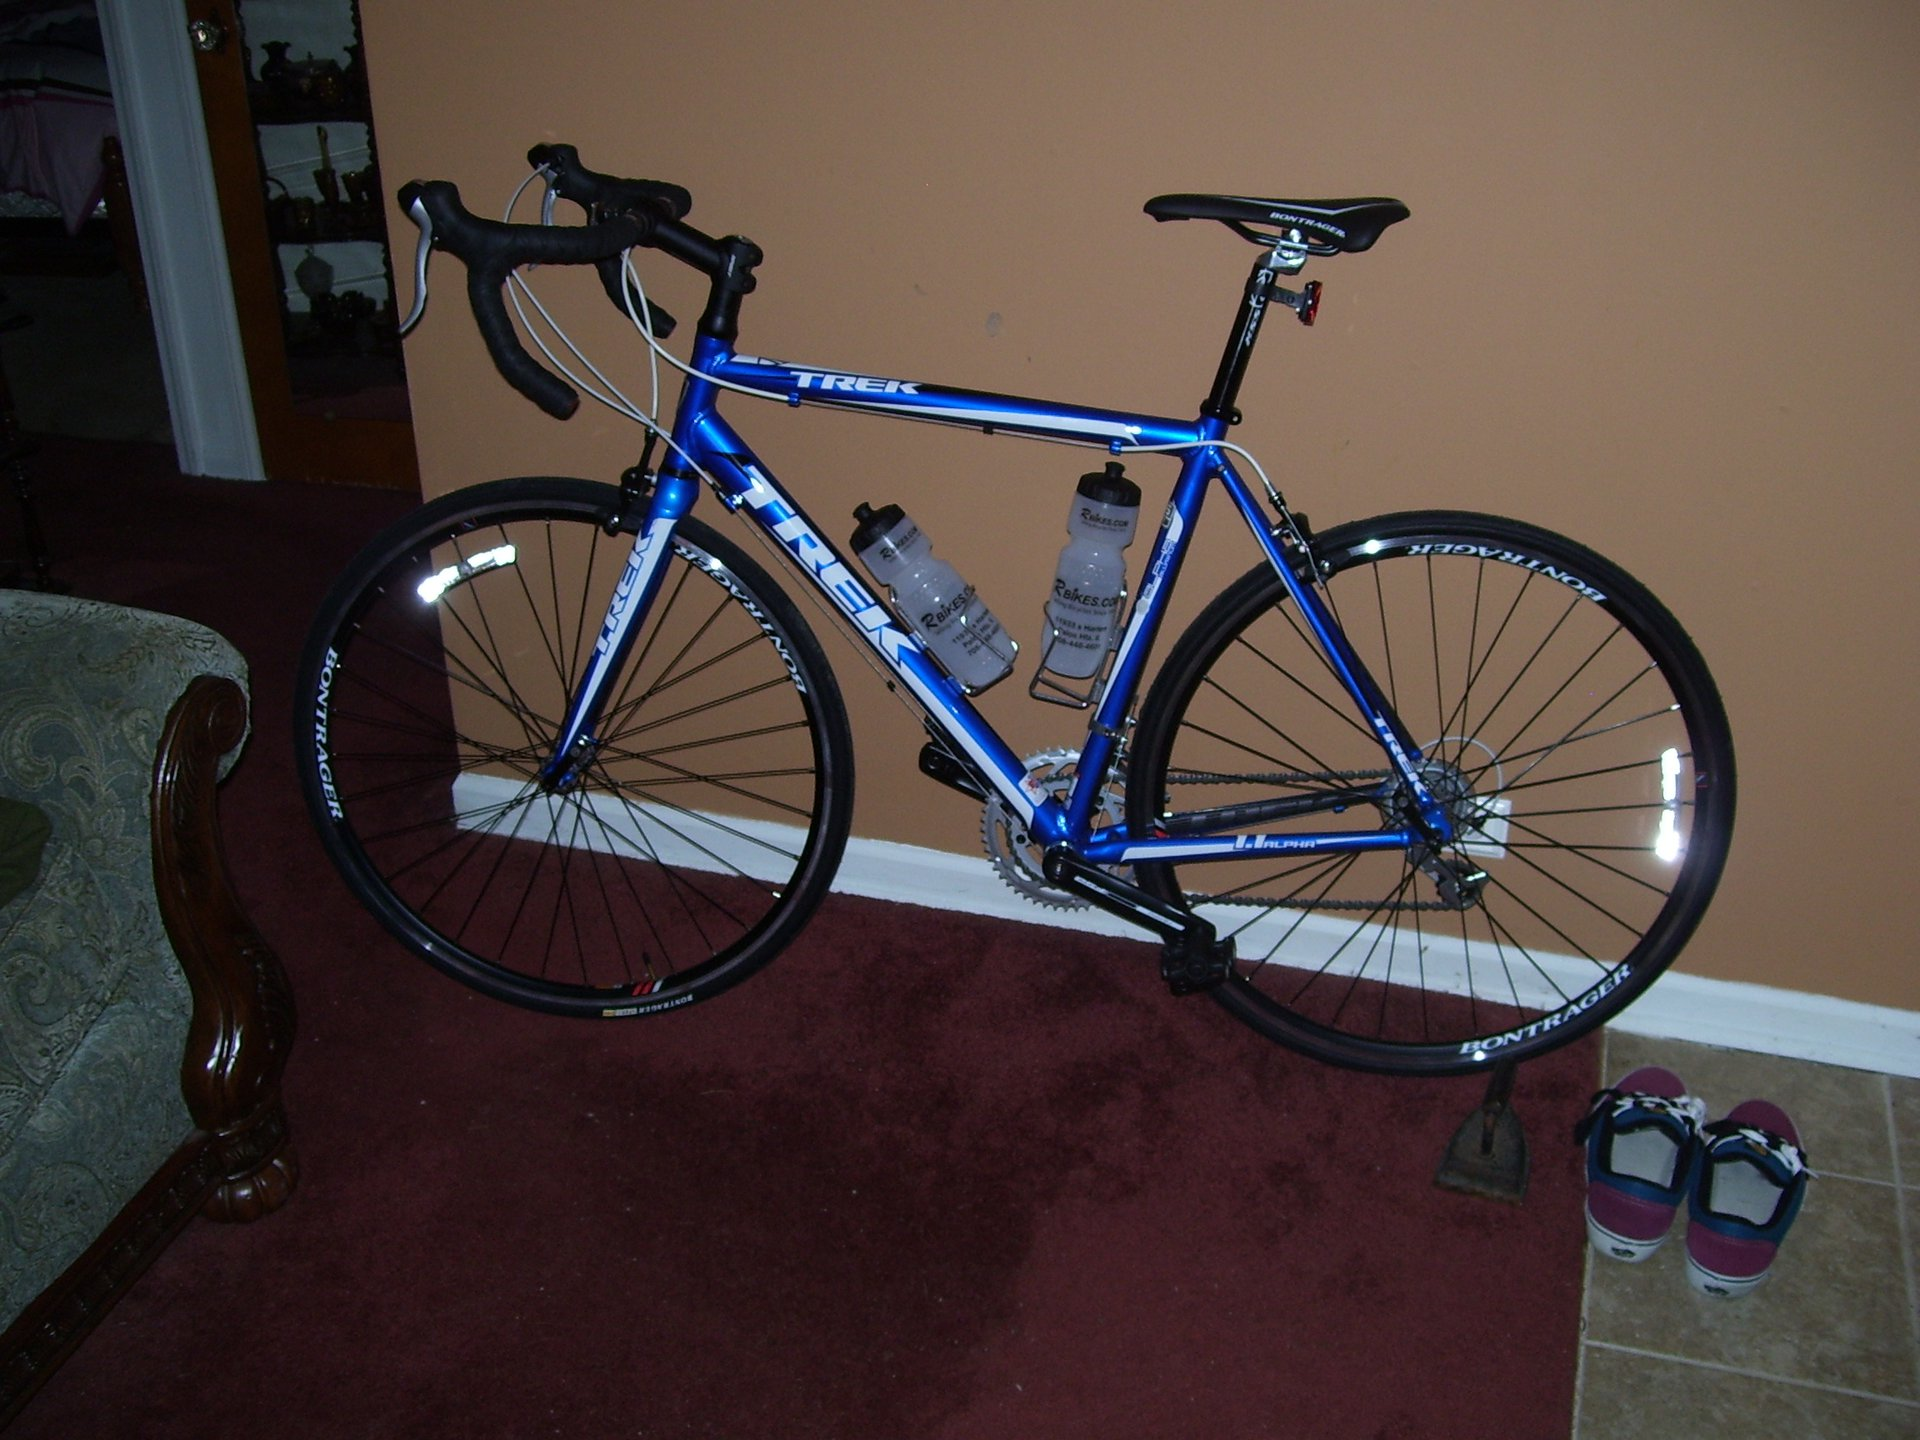 My new cycling bike it's pretty cool